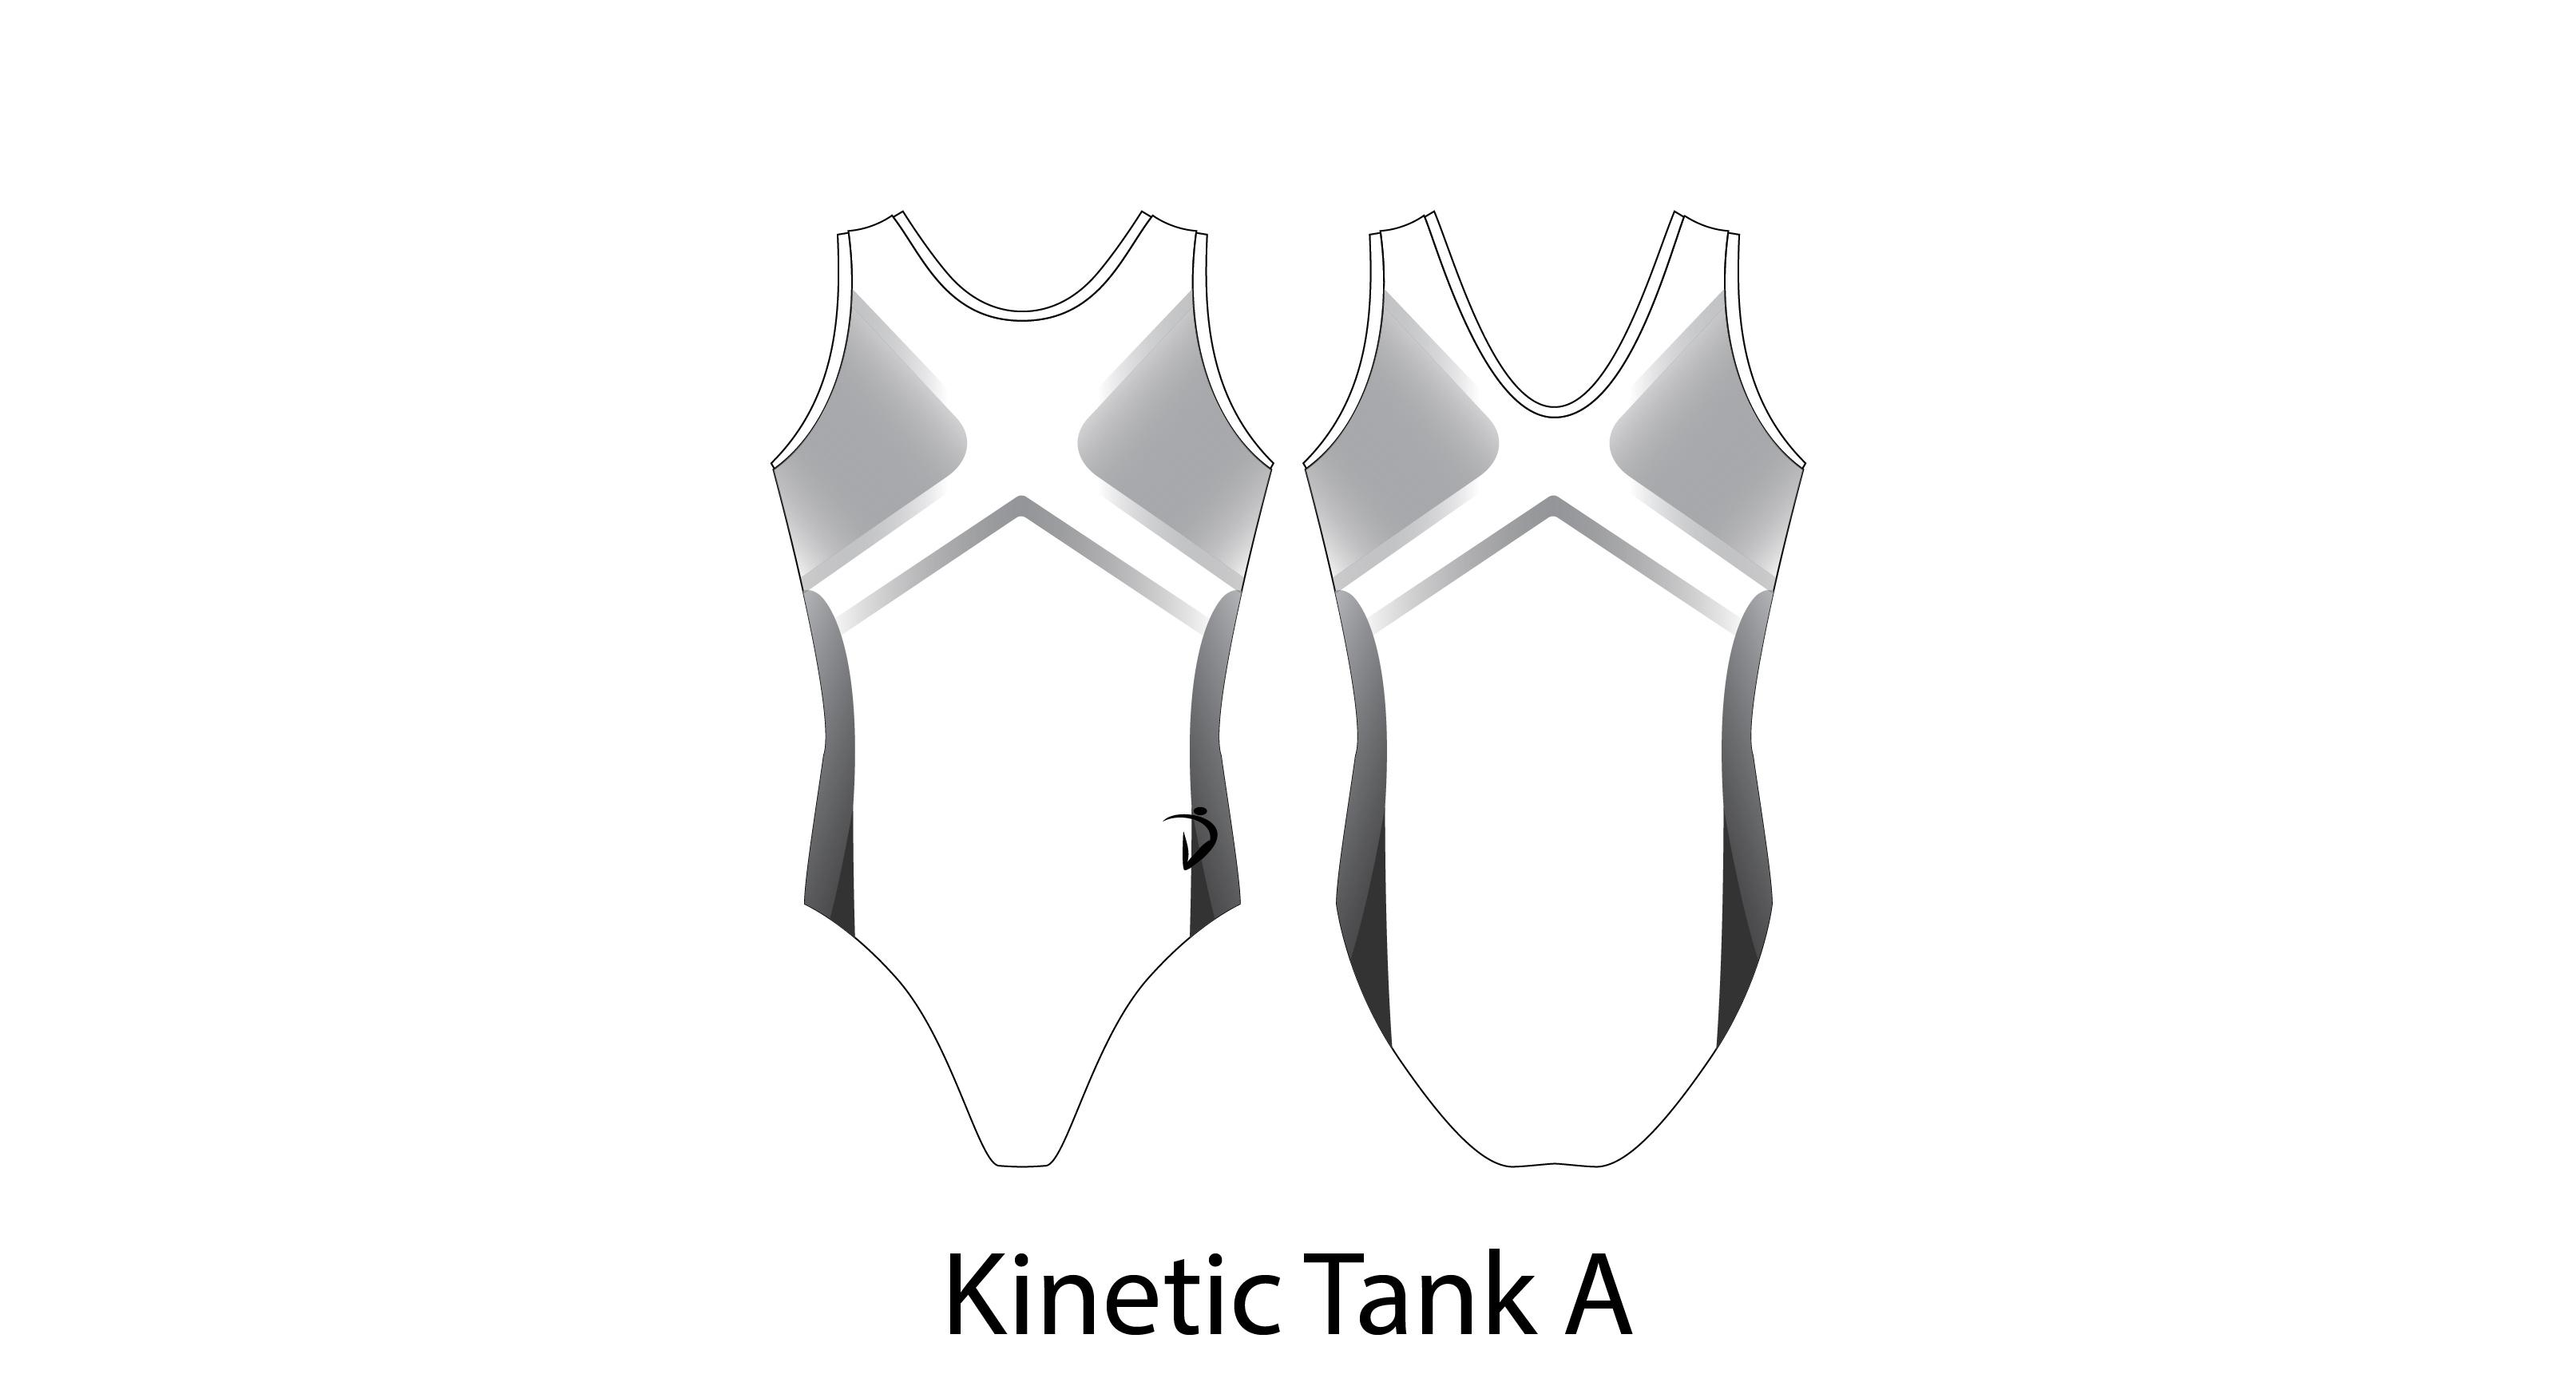 Kinetic Tank A